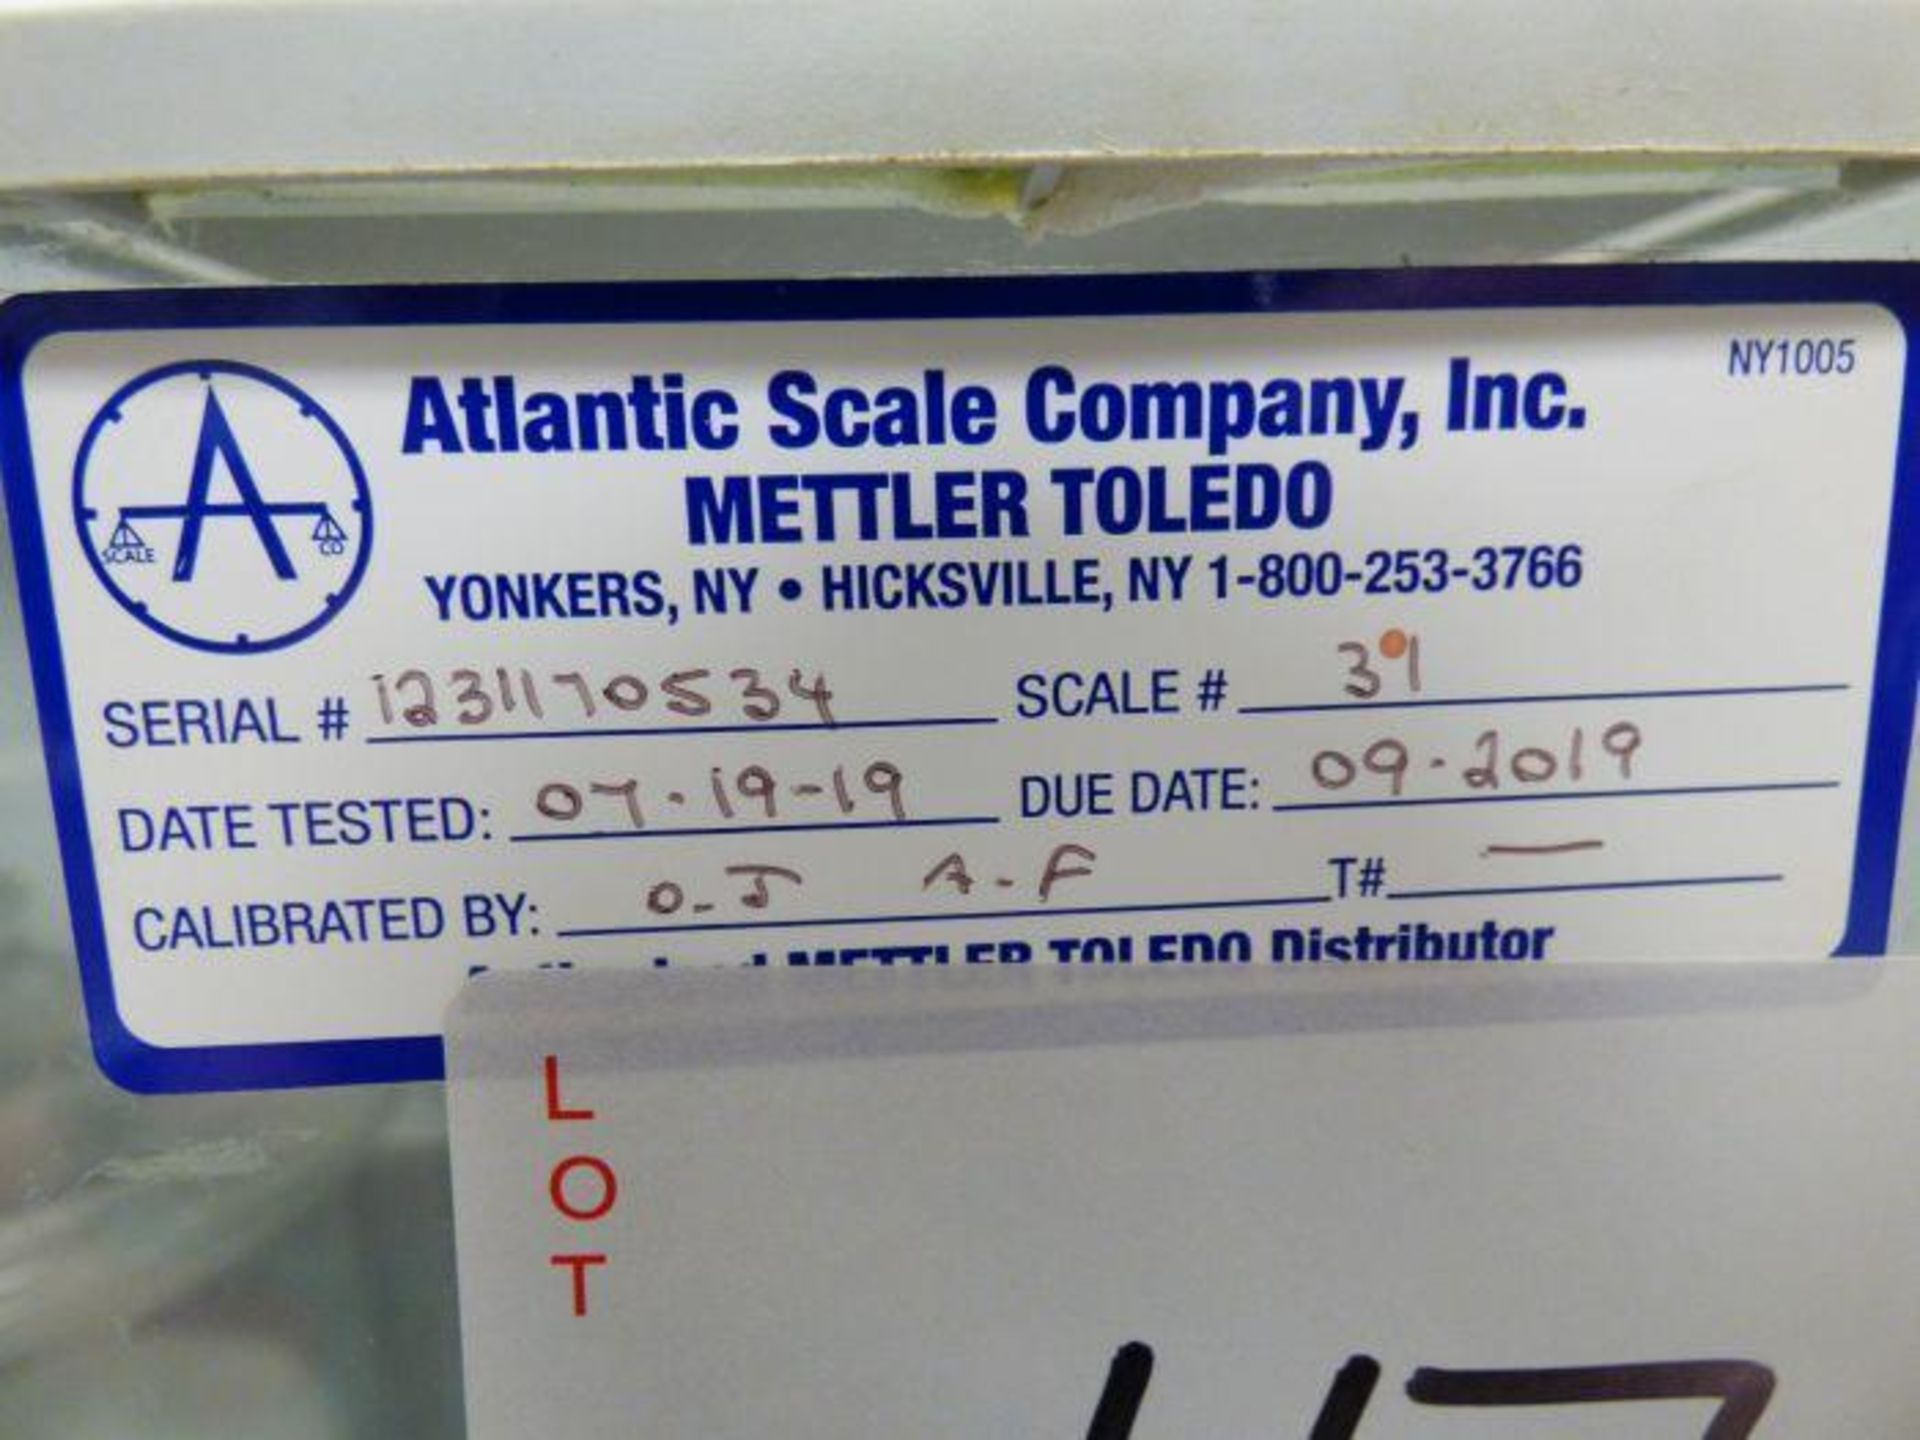 Lot 1047 - Mettler Toledo Scale